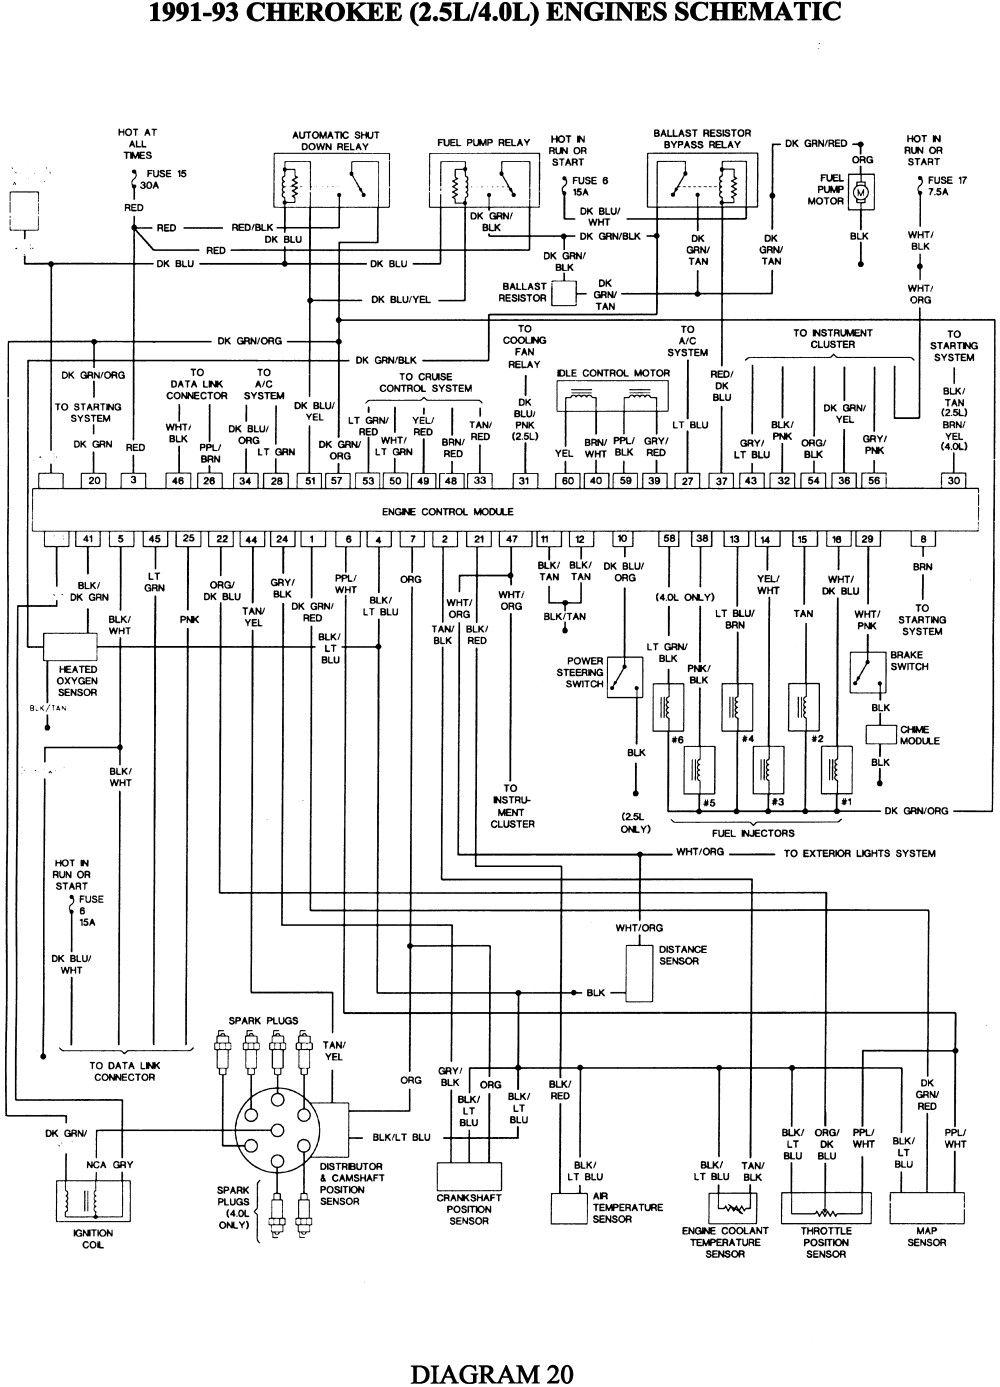 2000 jeep cherokee wiper wiring diagram | blog wiring diagram scrape  eject.gbmediagroup.it